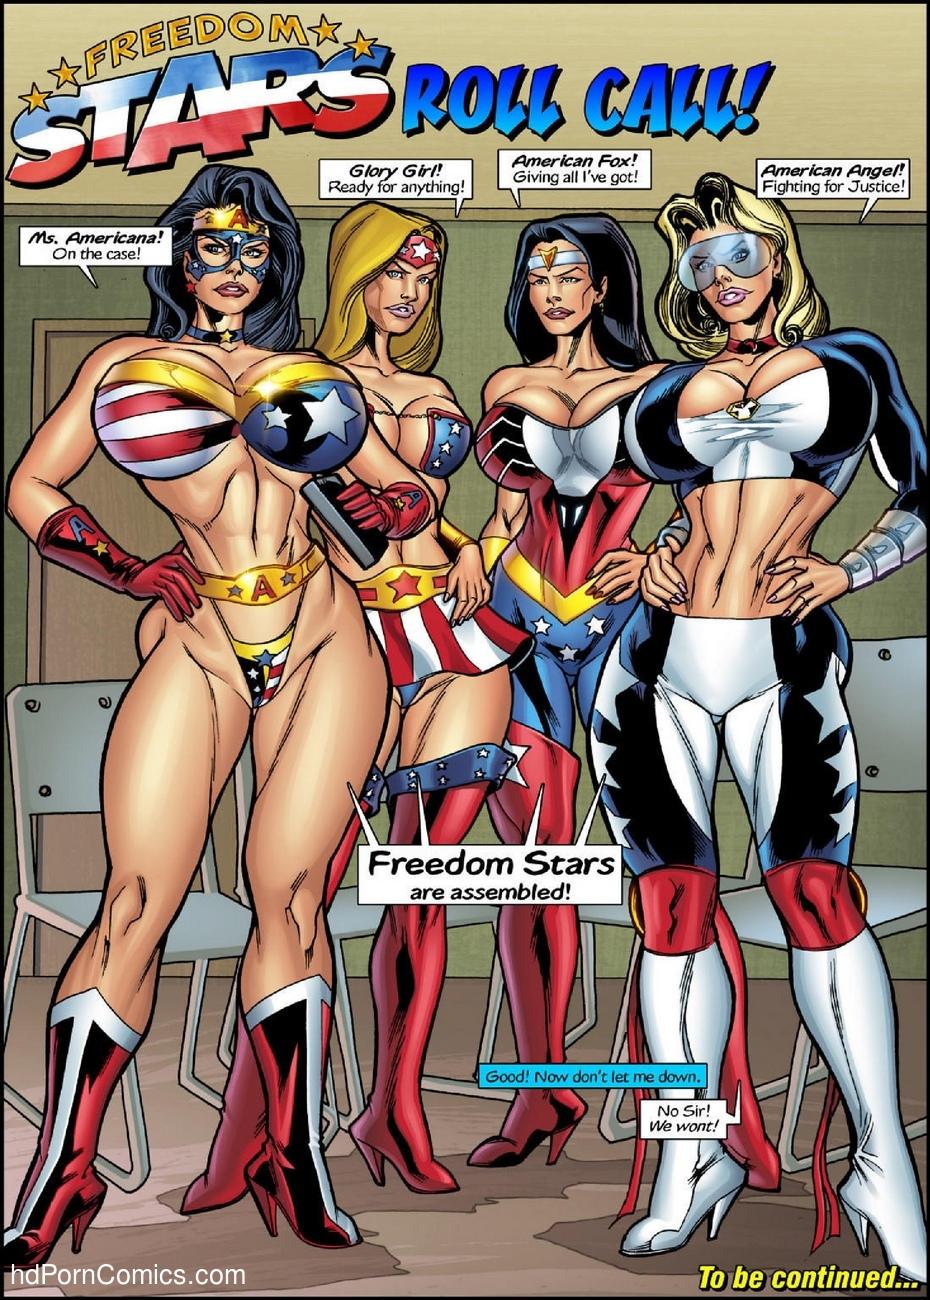 Freedom Stars - Cattle Call 1 4 free sex comic